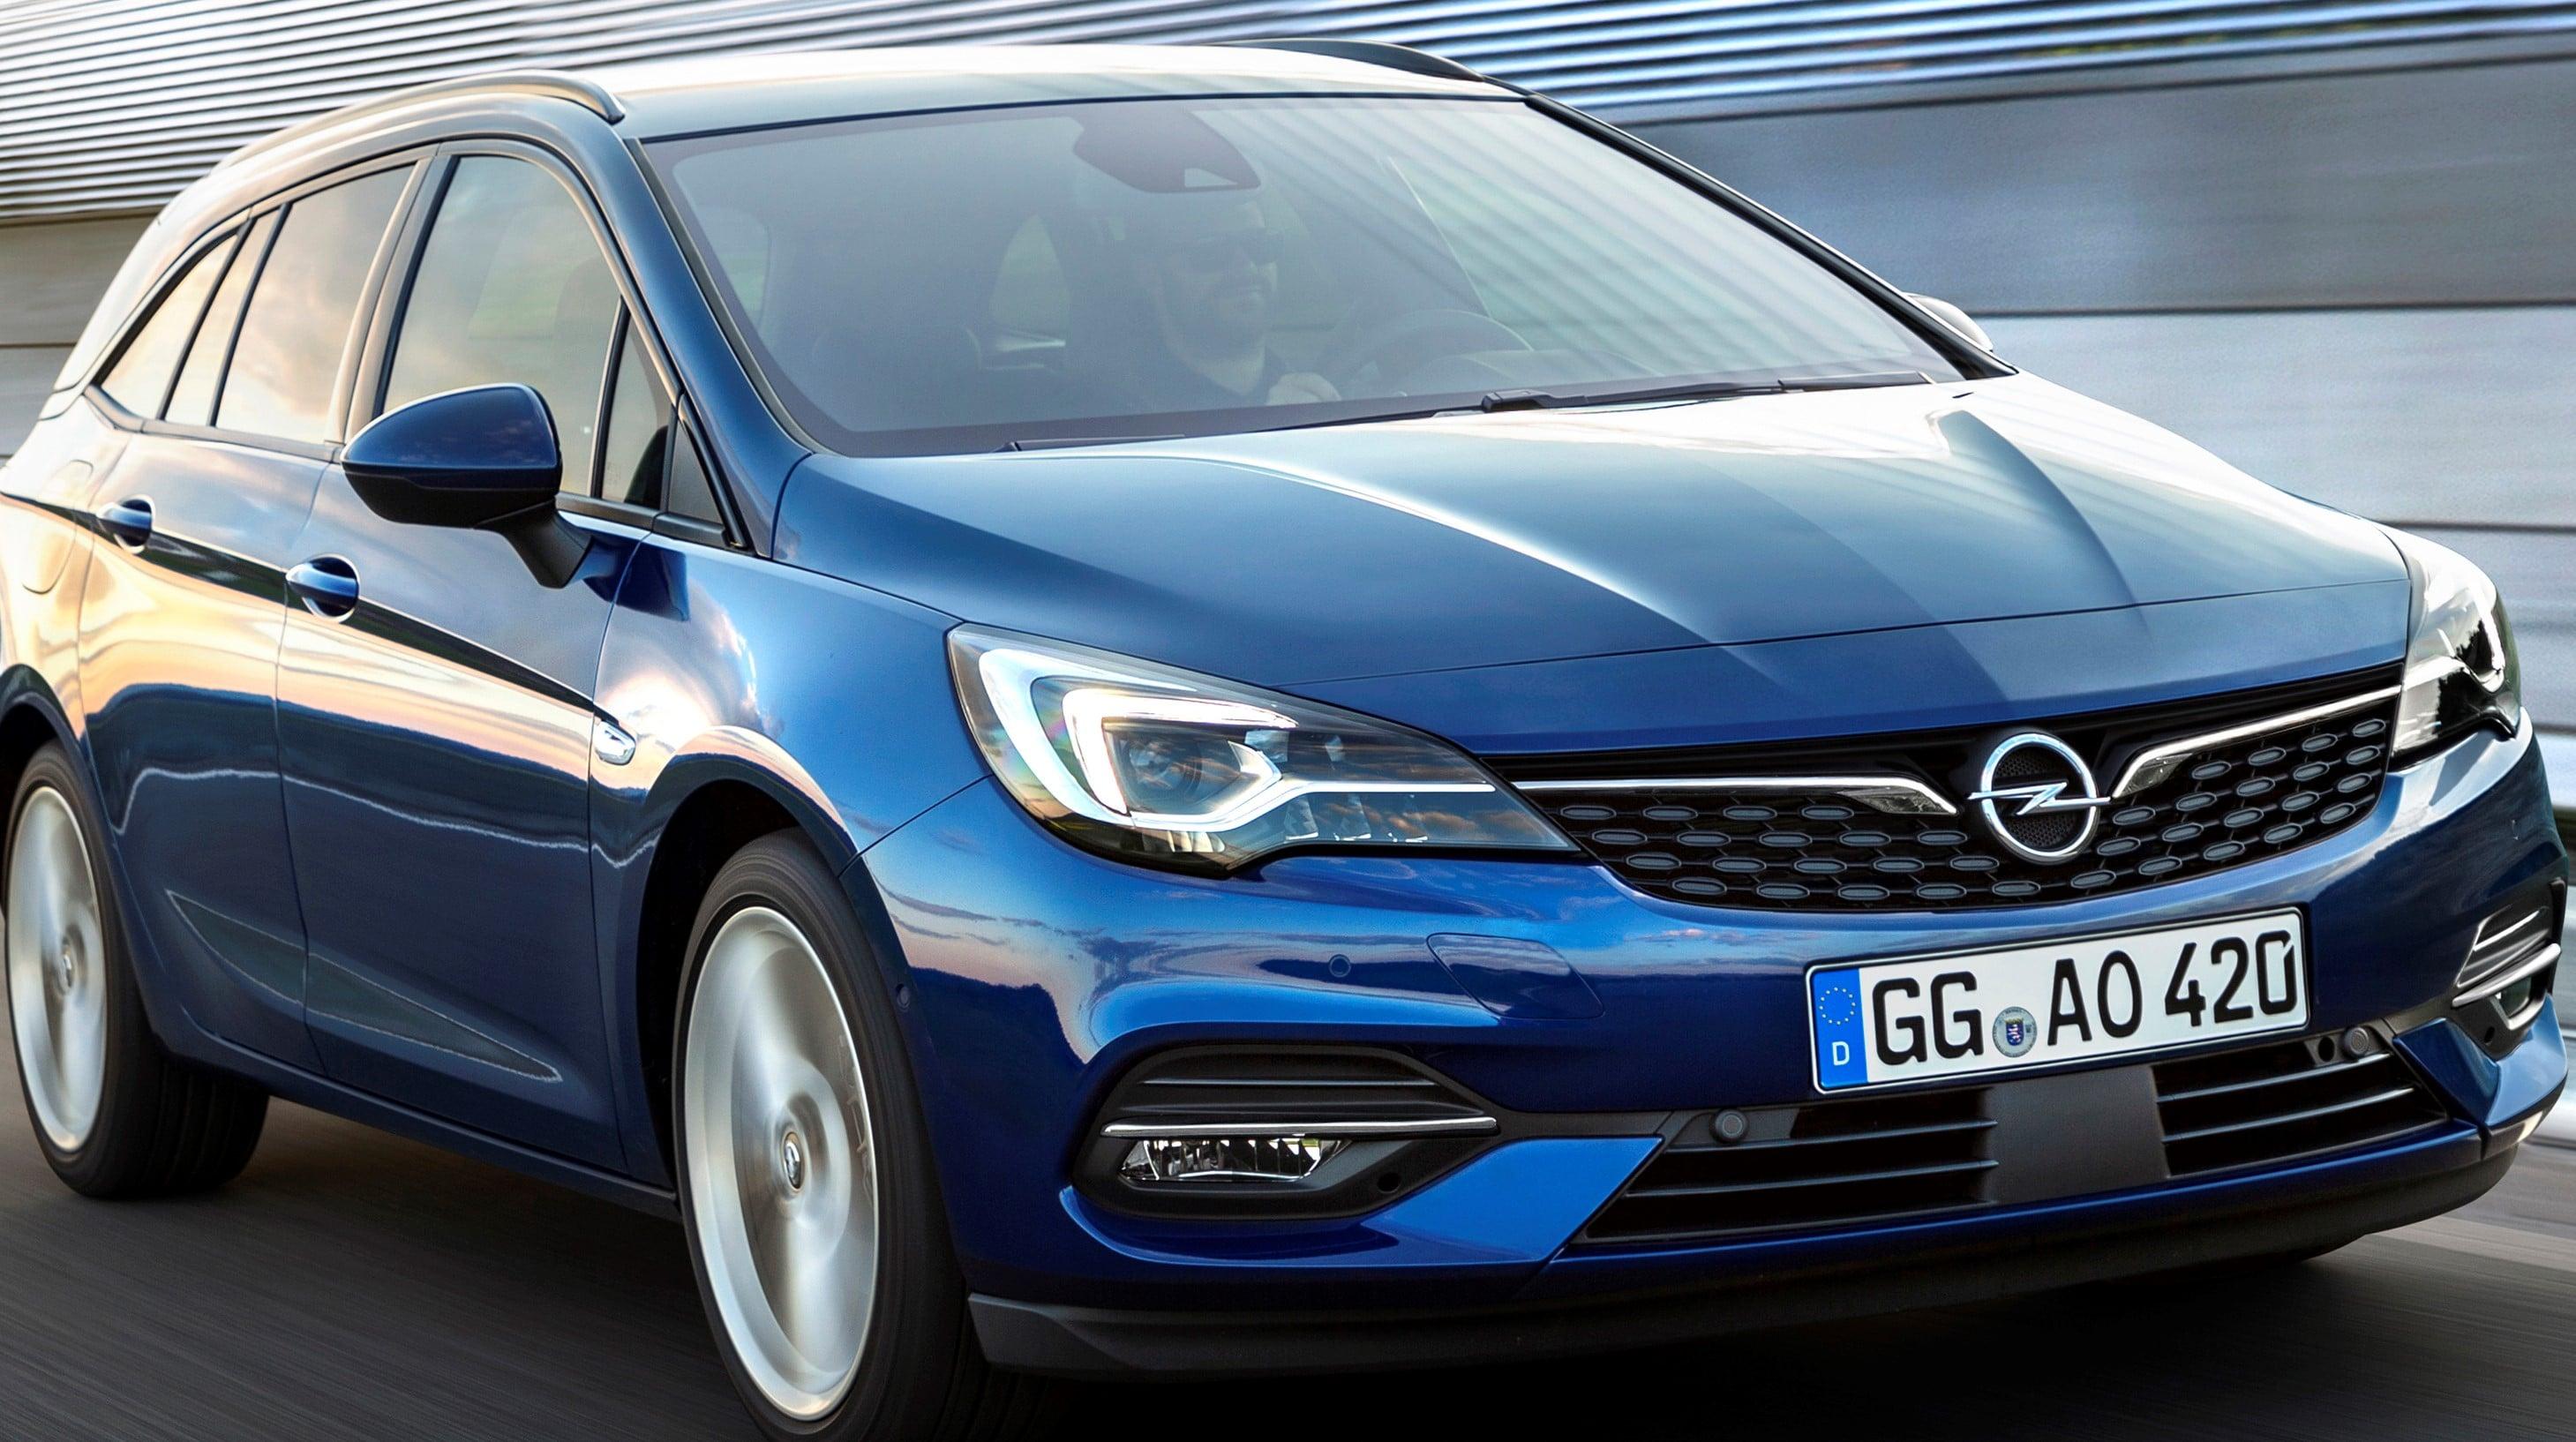 Inspektion bei einem Opel Astra K Sport Tourer 2019